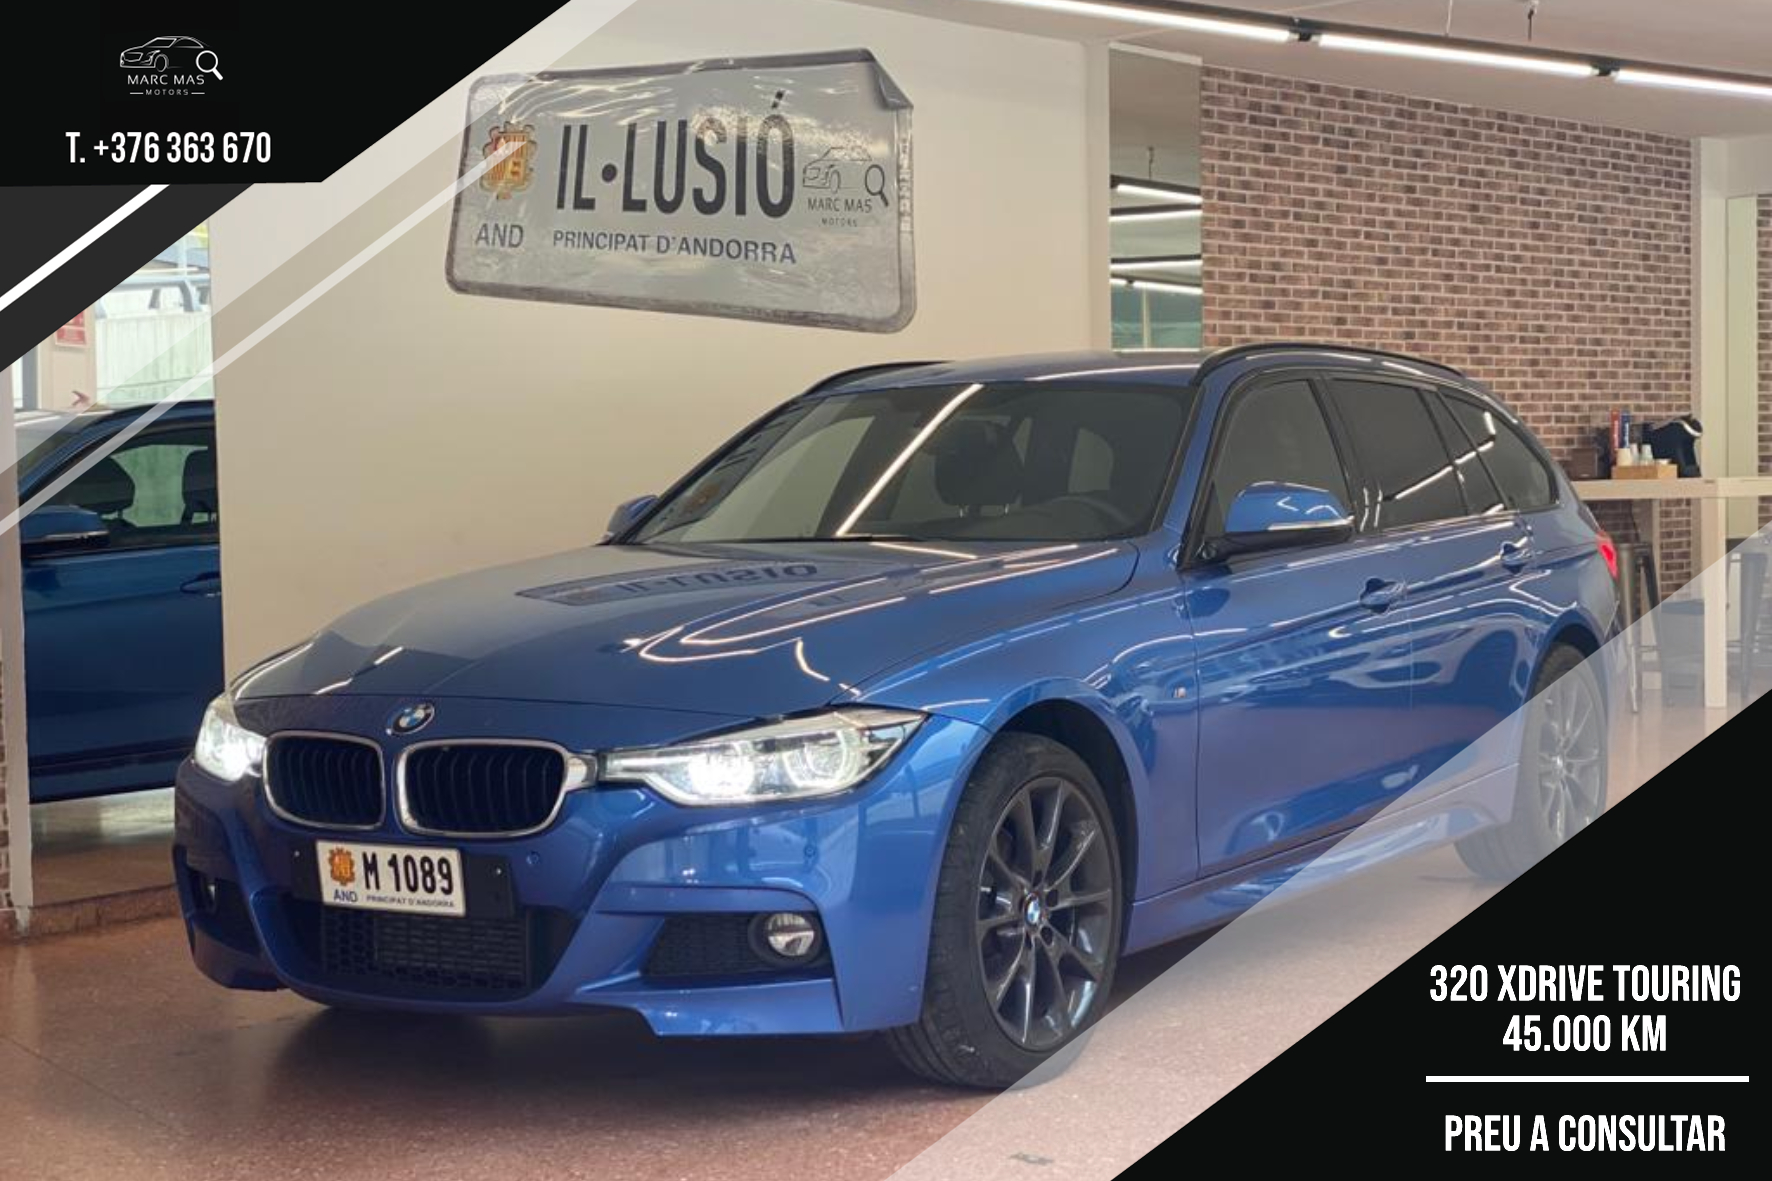 BMW - 320 D - 320D XDRIVE TOURING 320D XDRIVE TOURING Dièsel  2018  45.000 Km